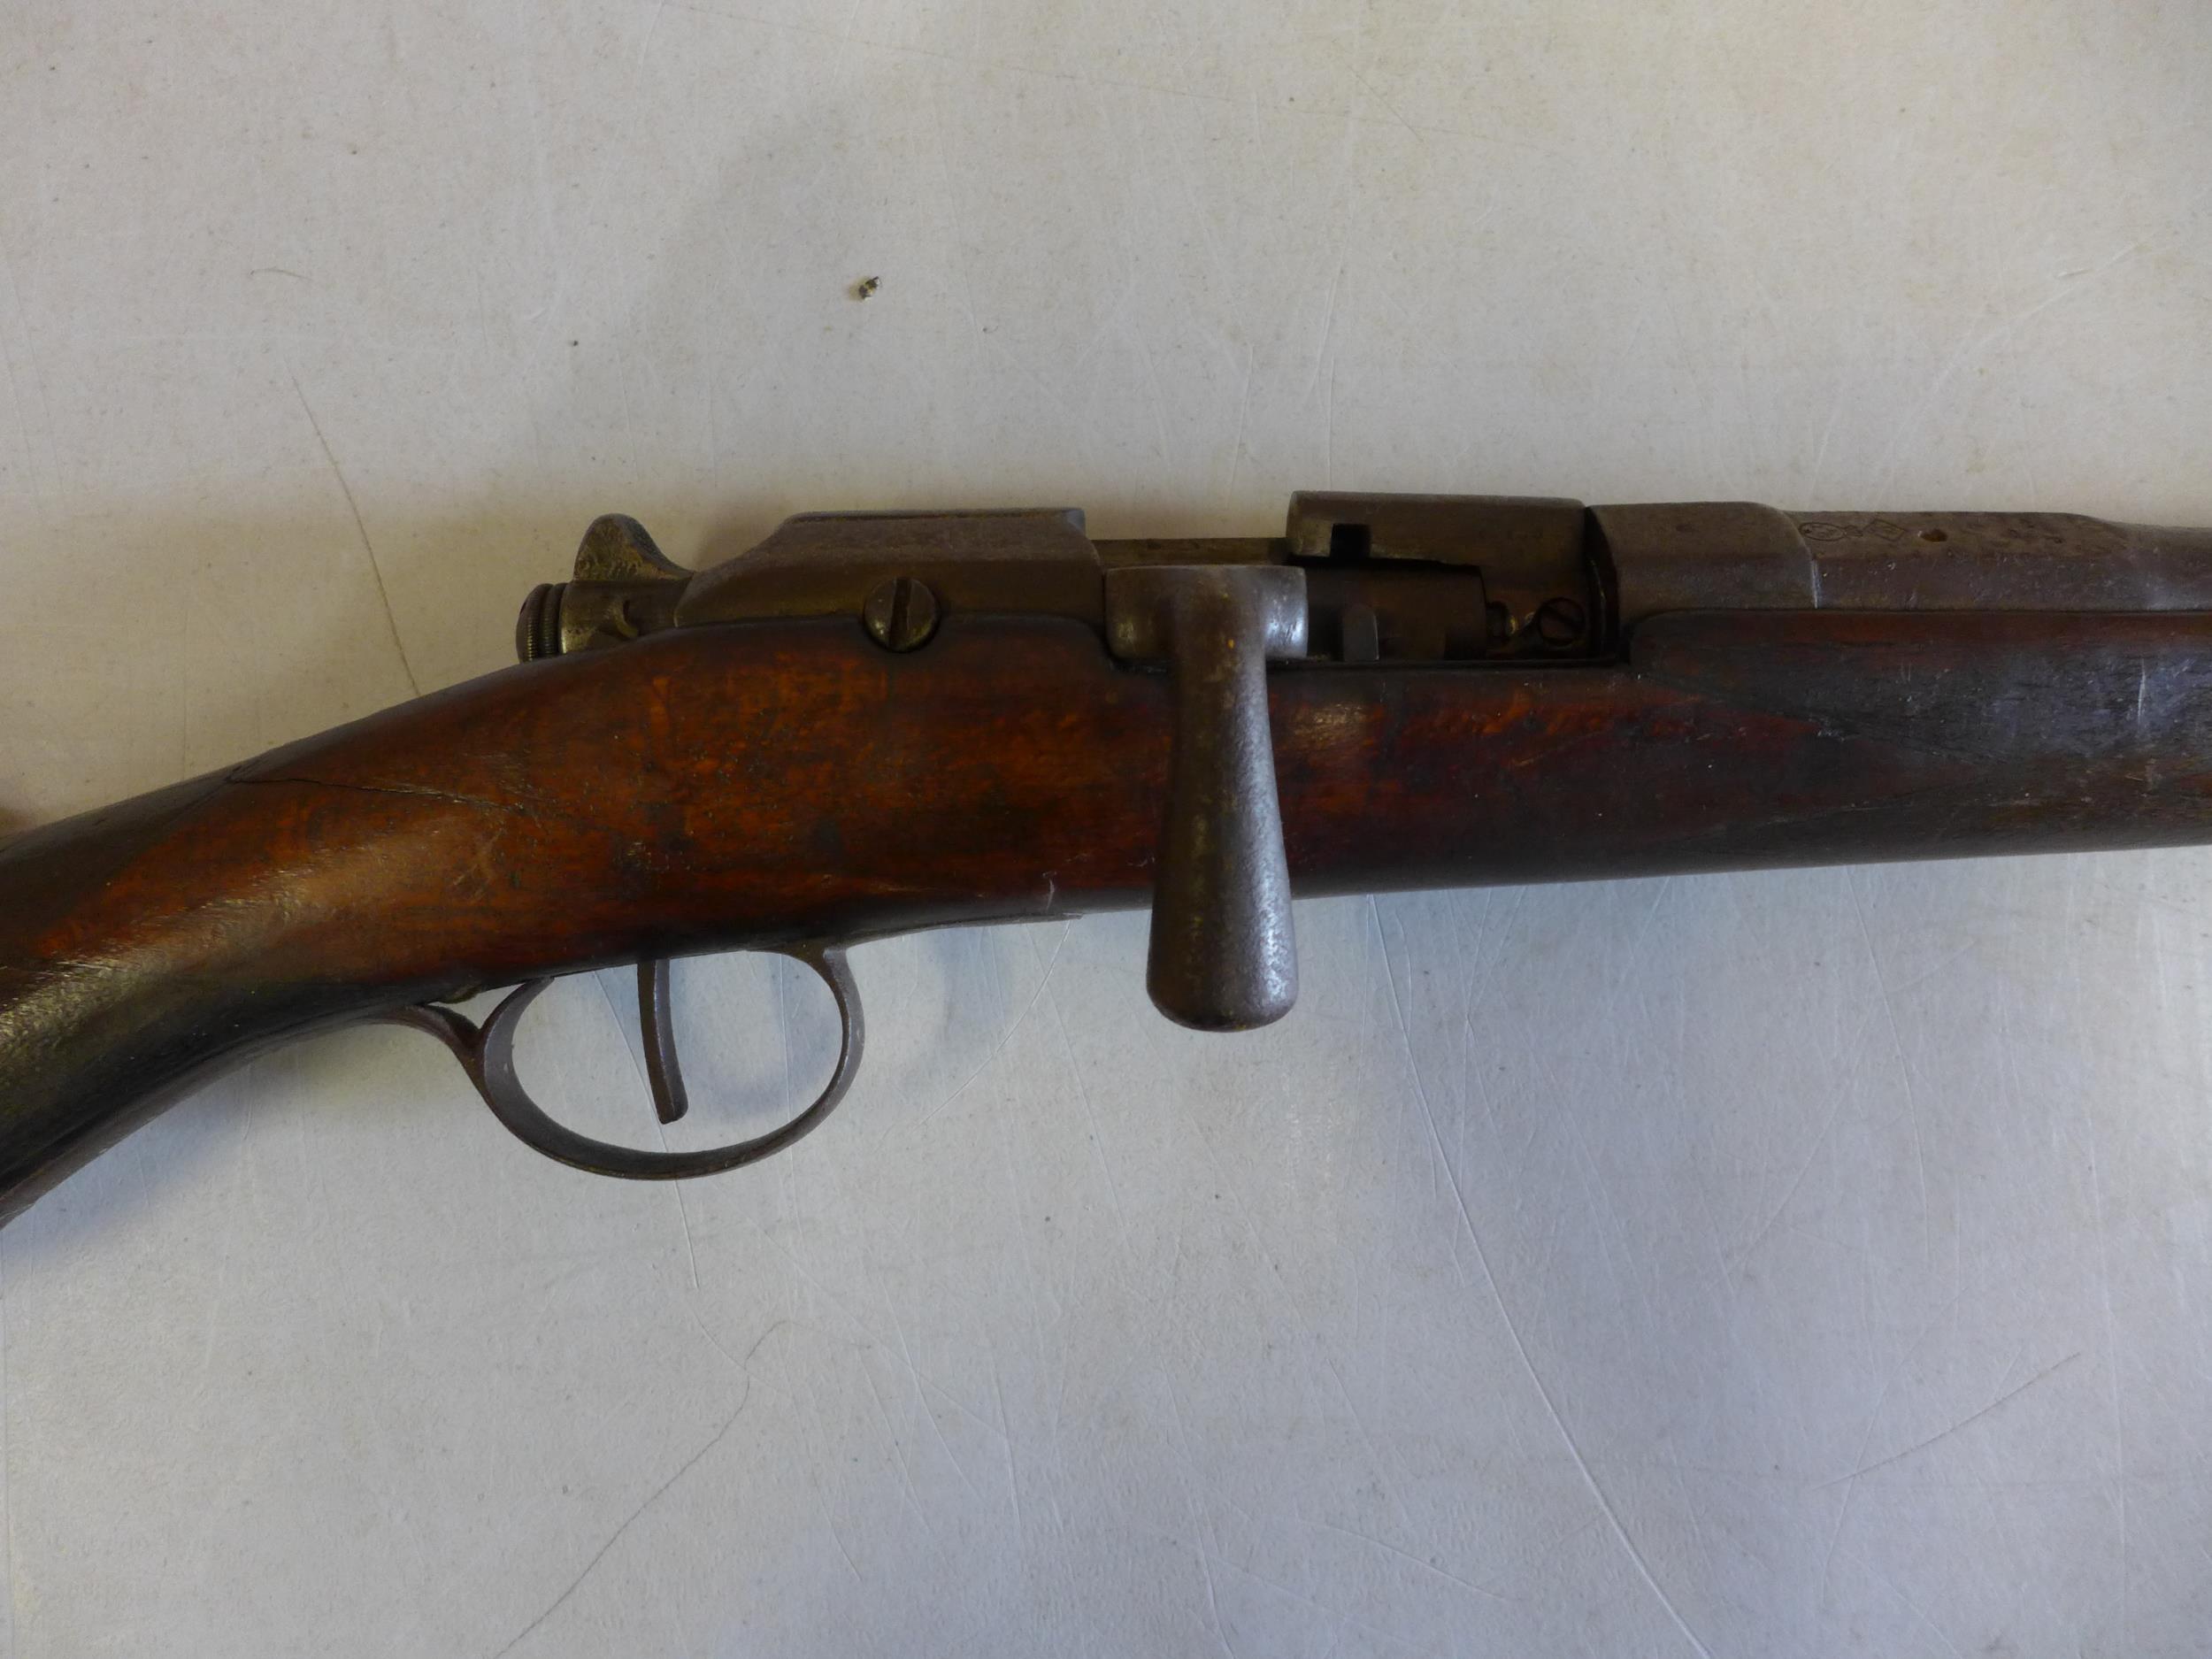 A BELGIUN MADE CHASSEPOT SMOOTH BORE BOLT ACTION SINGLE BARREL GUN, 71CM BARREL - Image 2 of 4